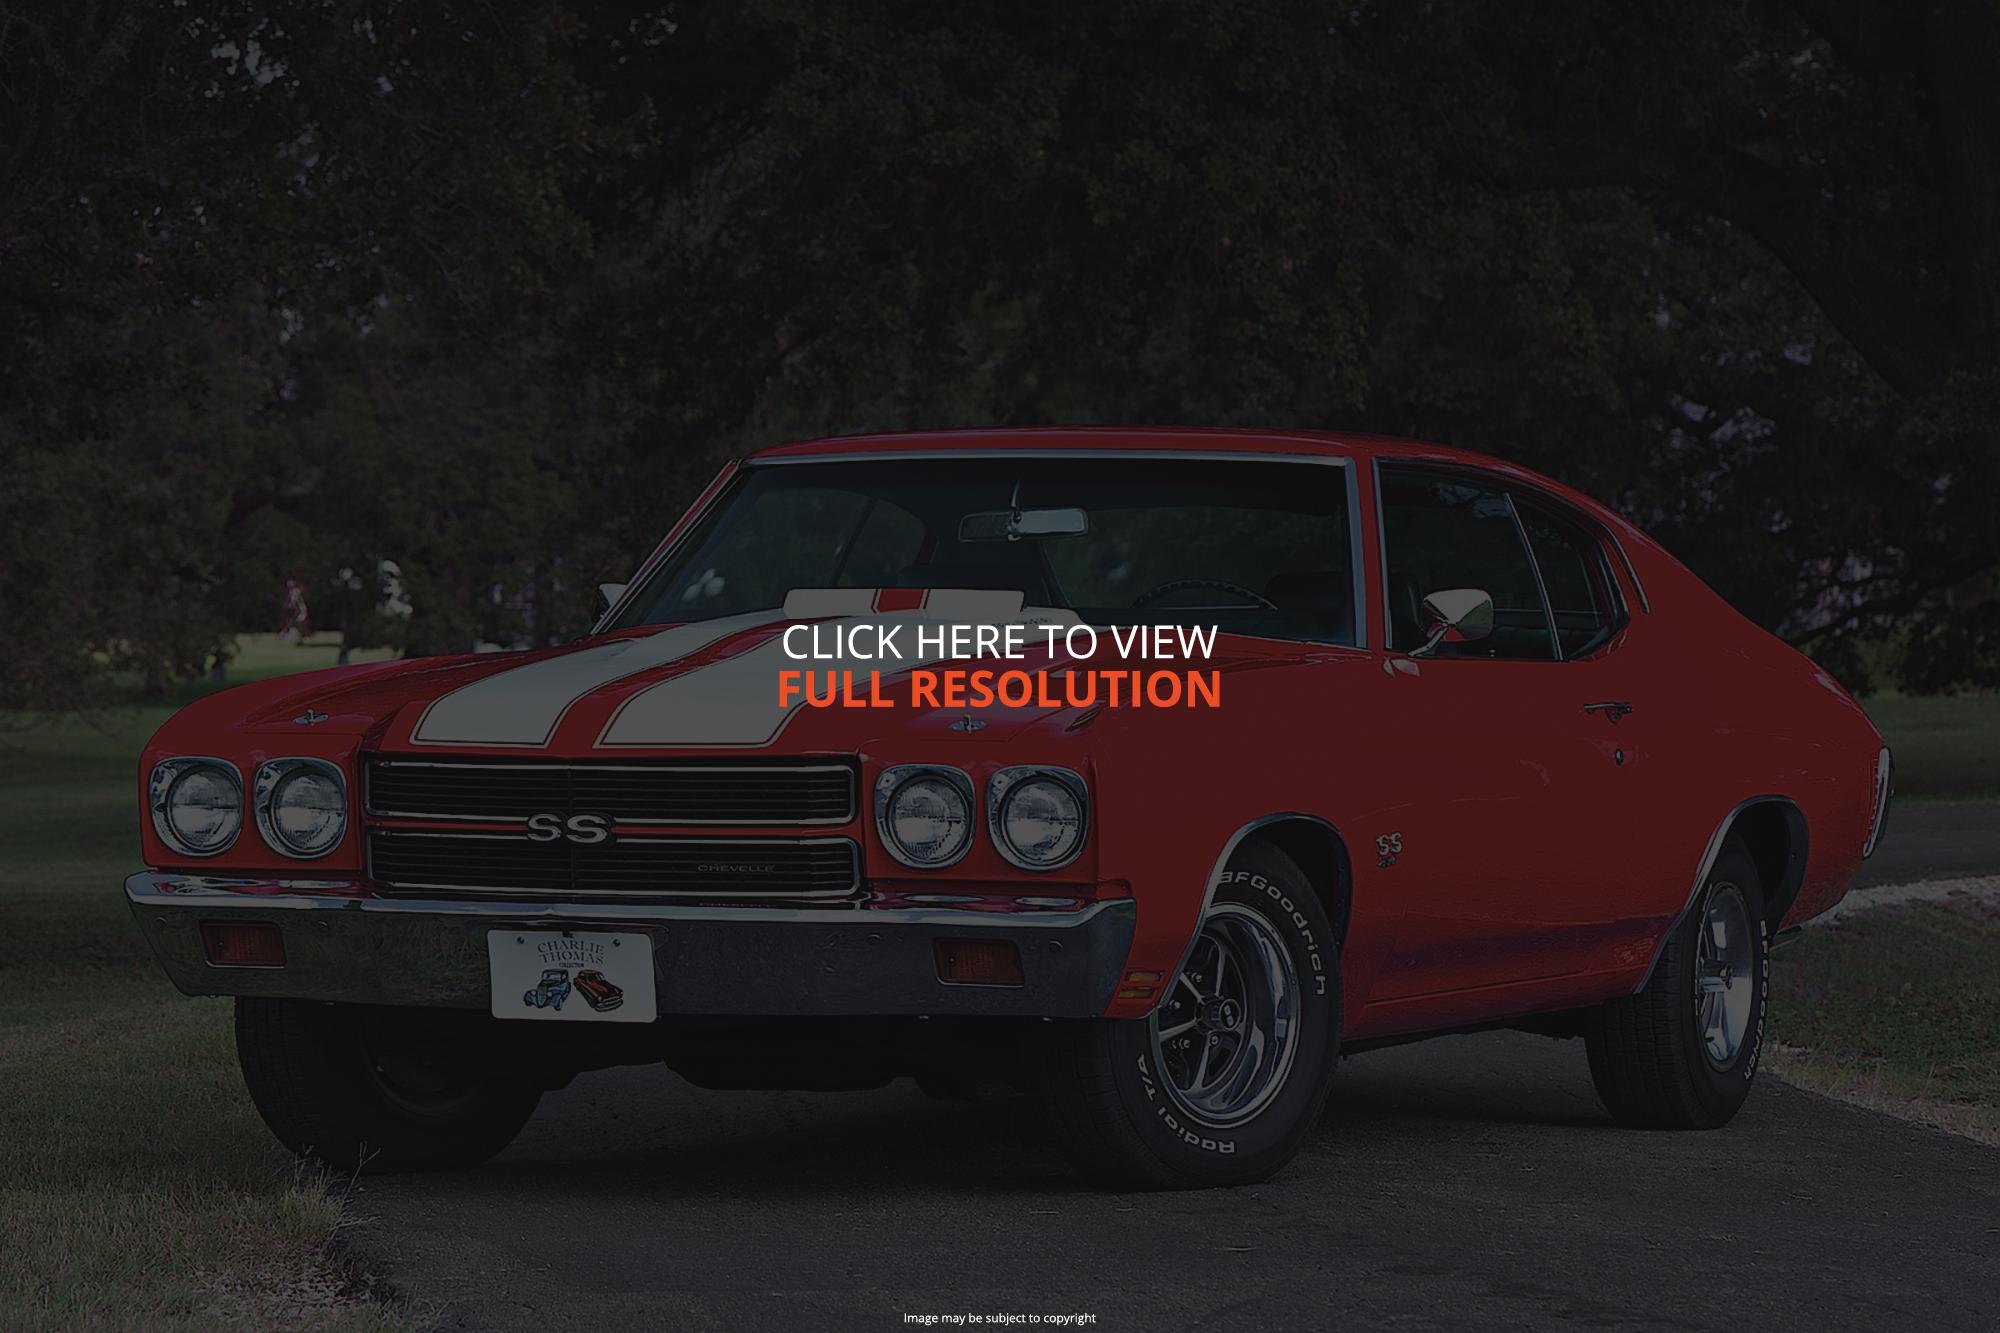 Chevrolet Ss 1971 foto - 5